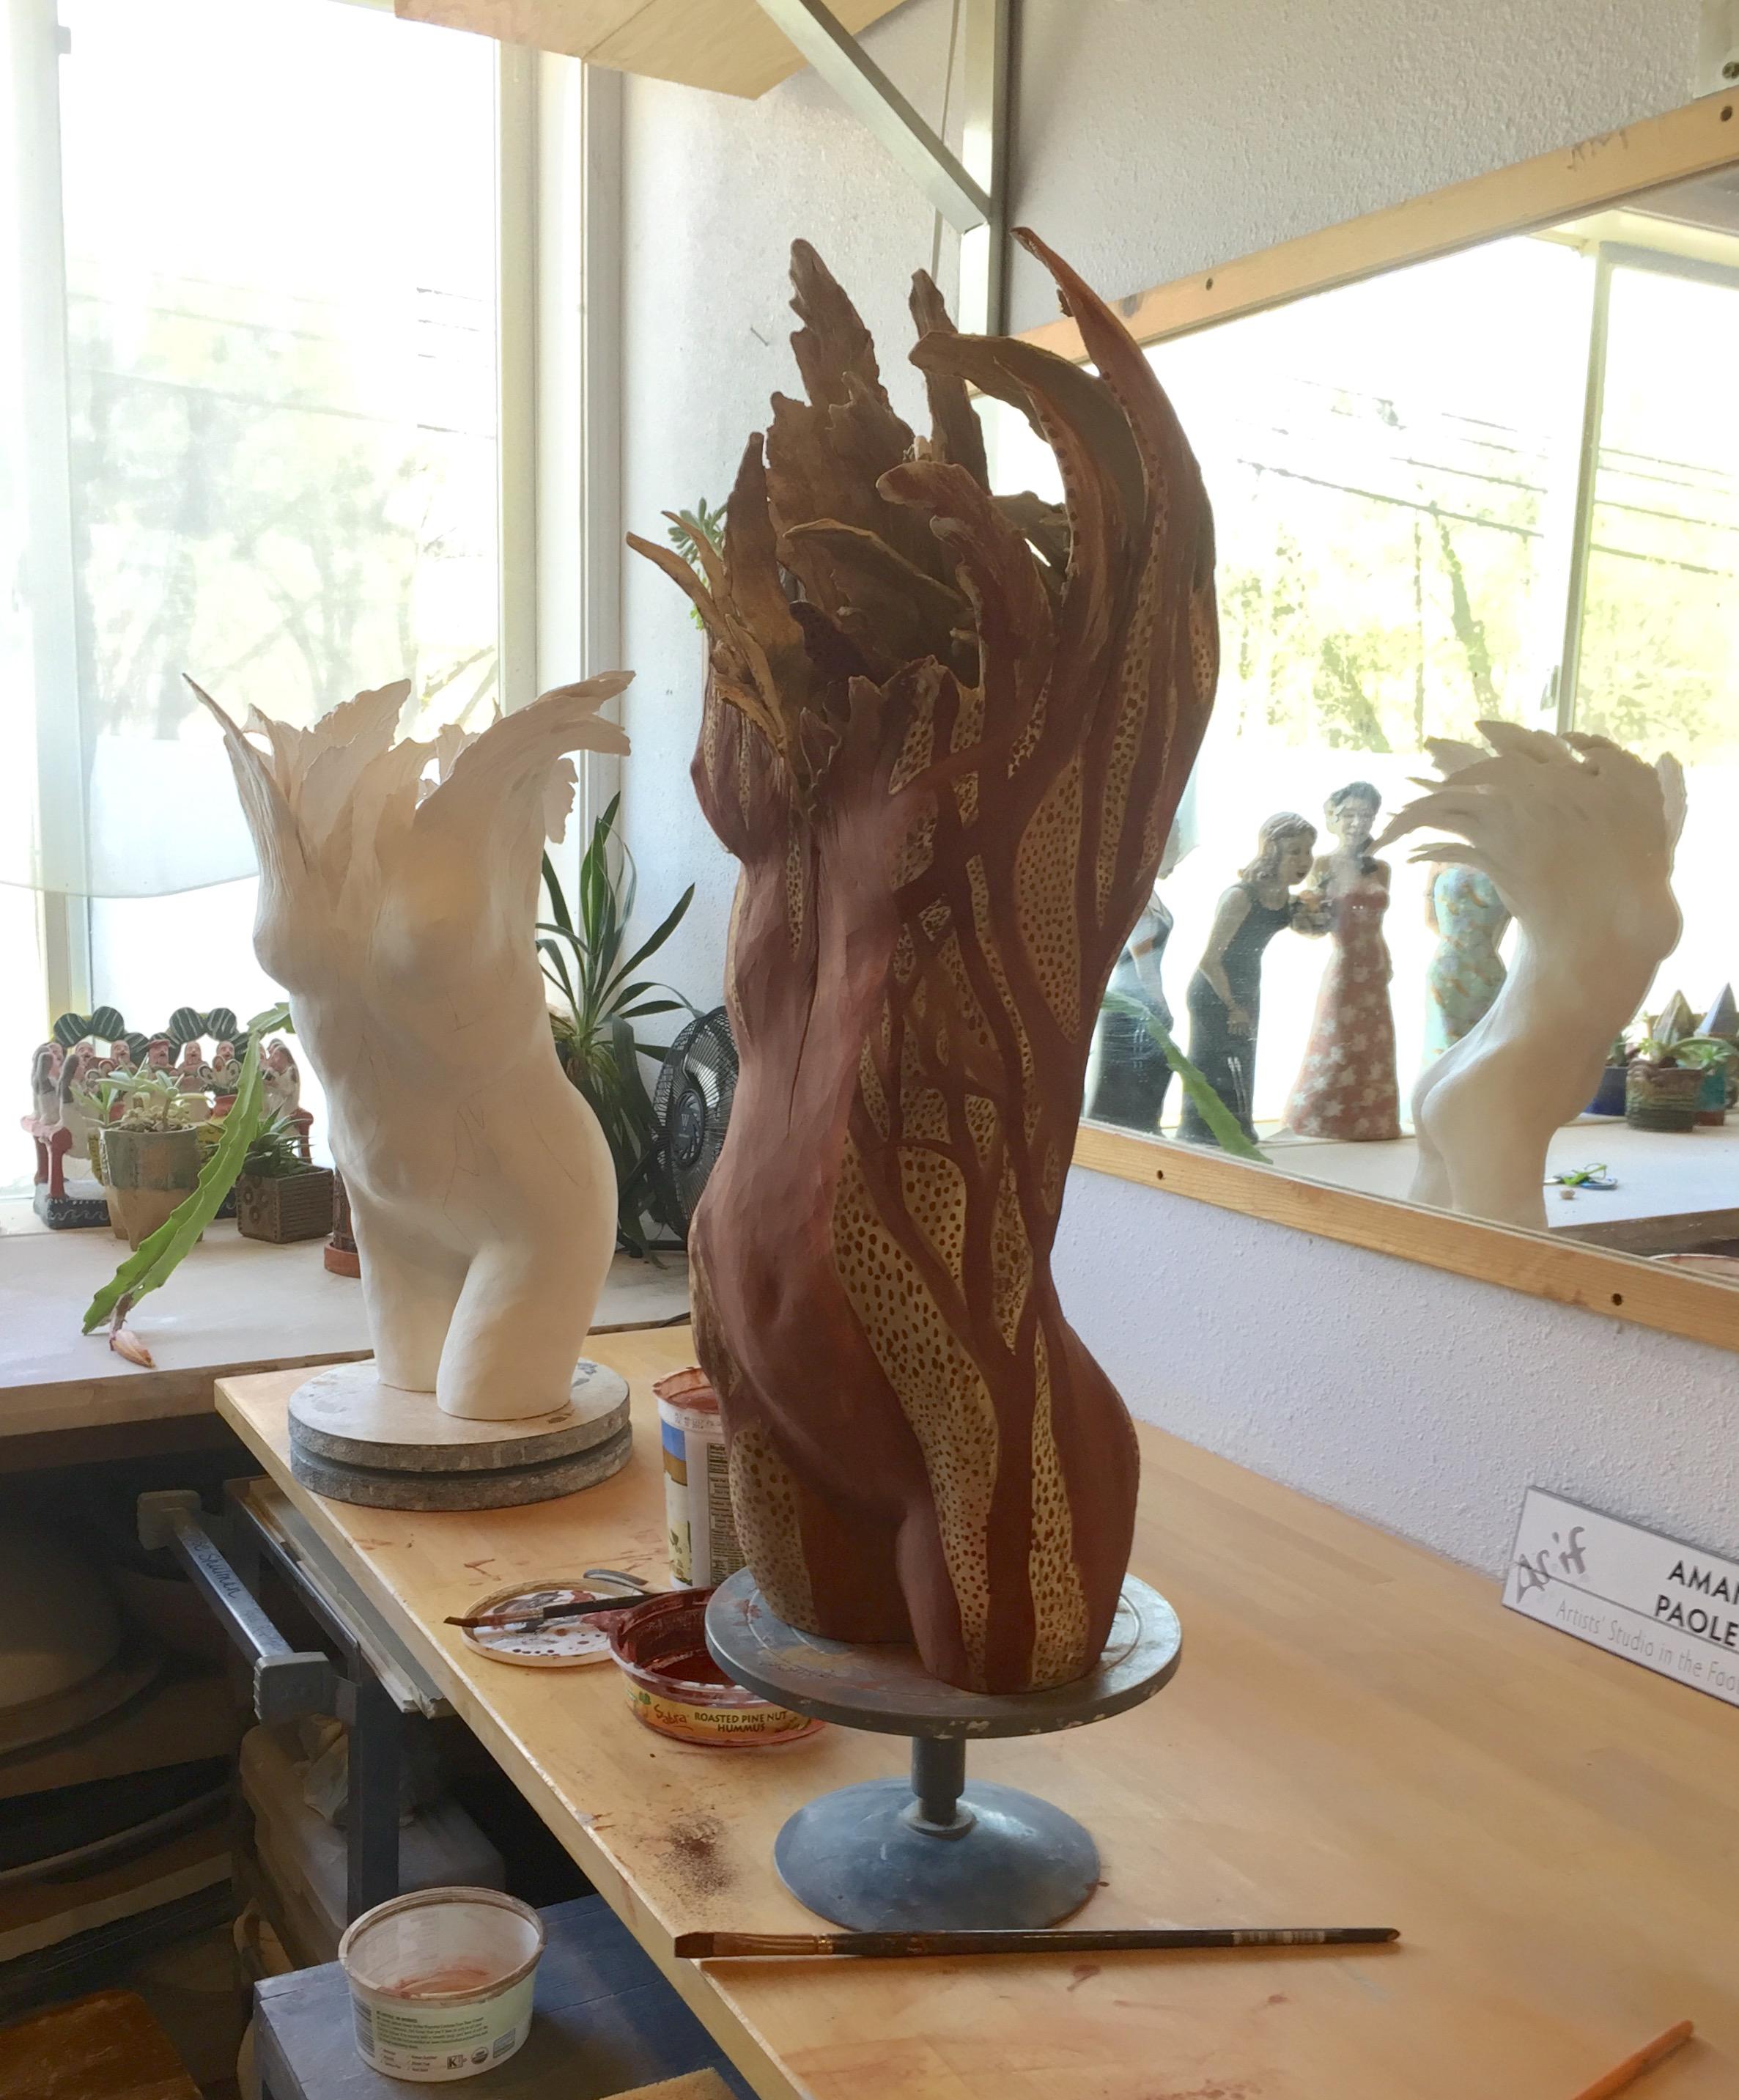 Amanda Paoletti.Studio Shot.2.Figurative Tree Series.2018.jpg